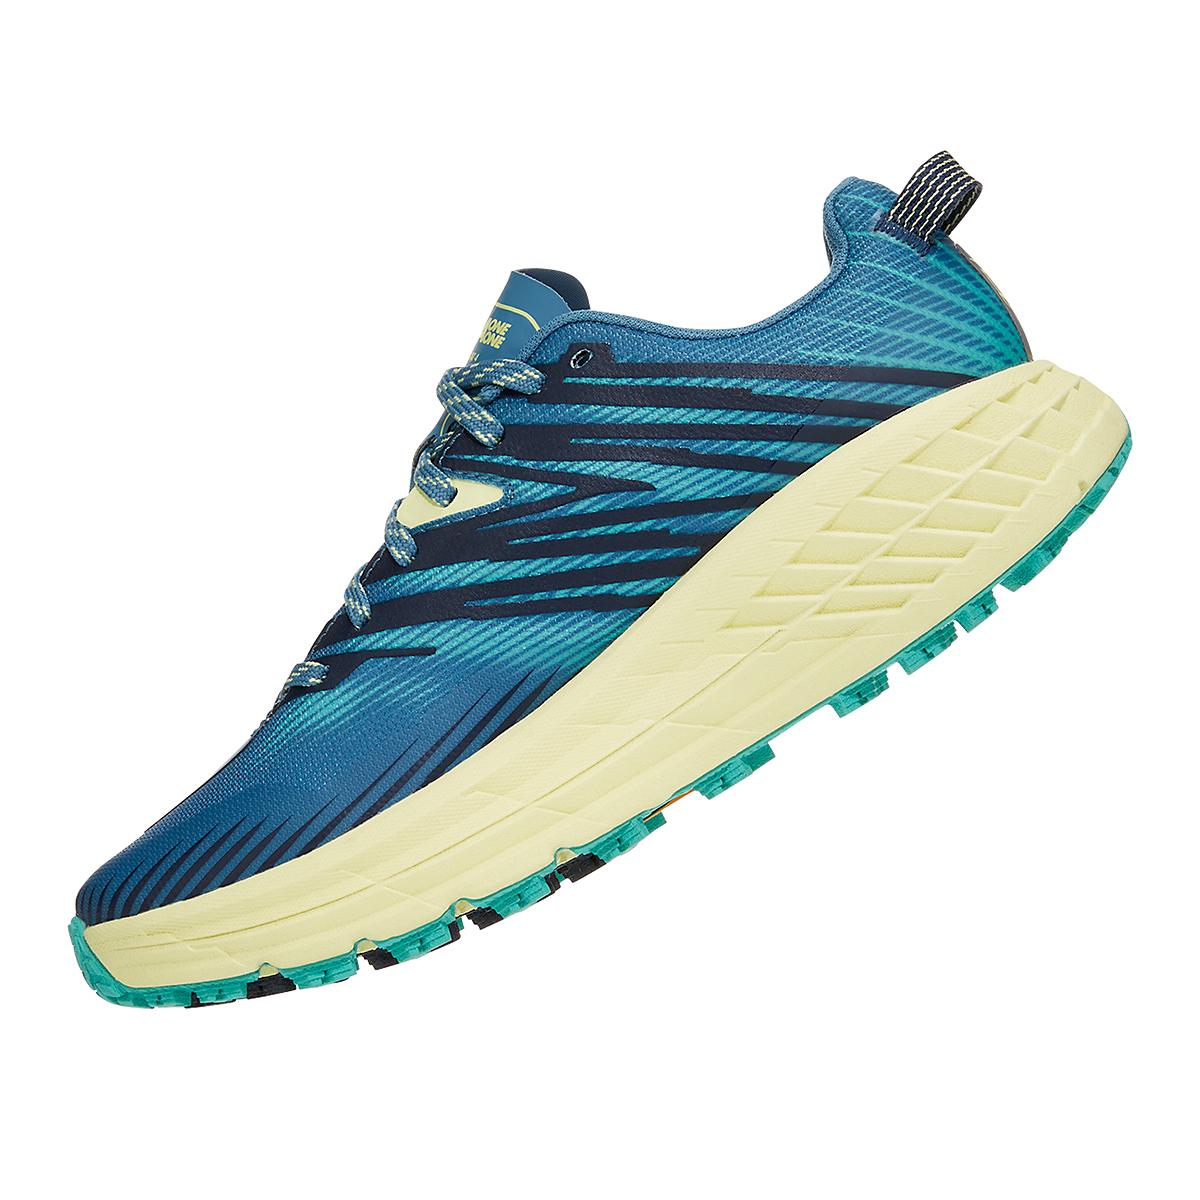 Women's Hoka One One Speedgoat 4 Running Shoe - Color: Provincial Blue/Luminary Green - Size: 5 - Width: Regular, Provincial Blue/Luminary Green, large, image 2